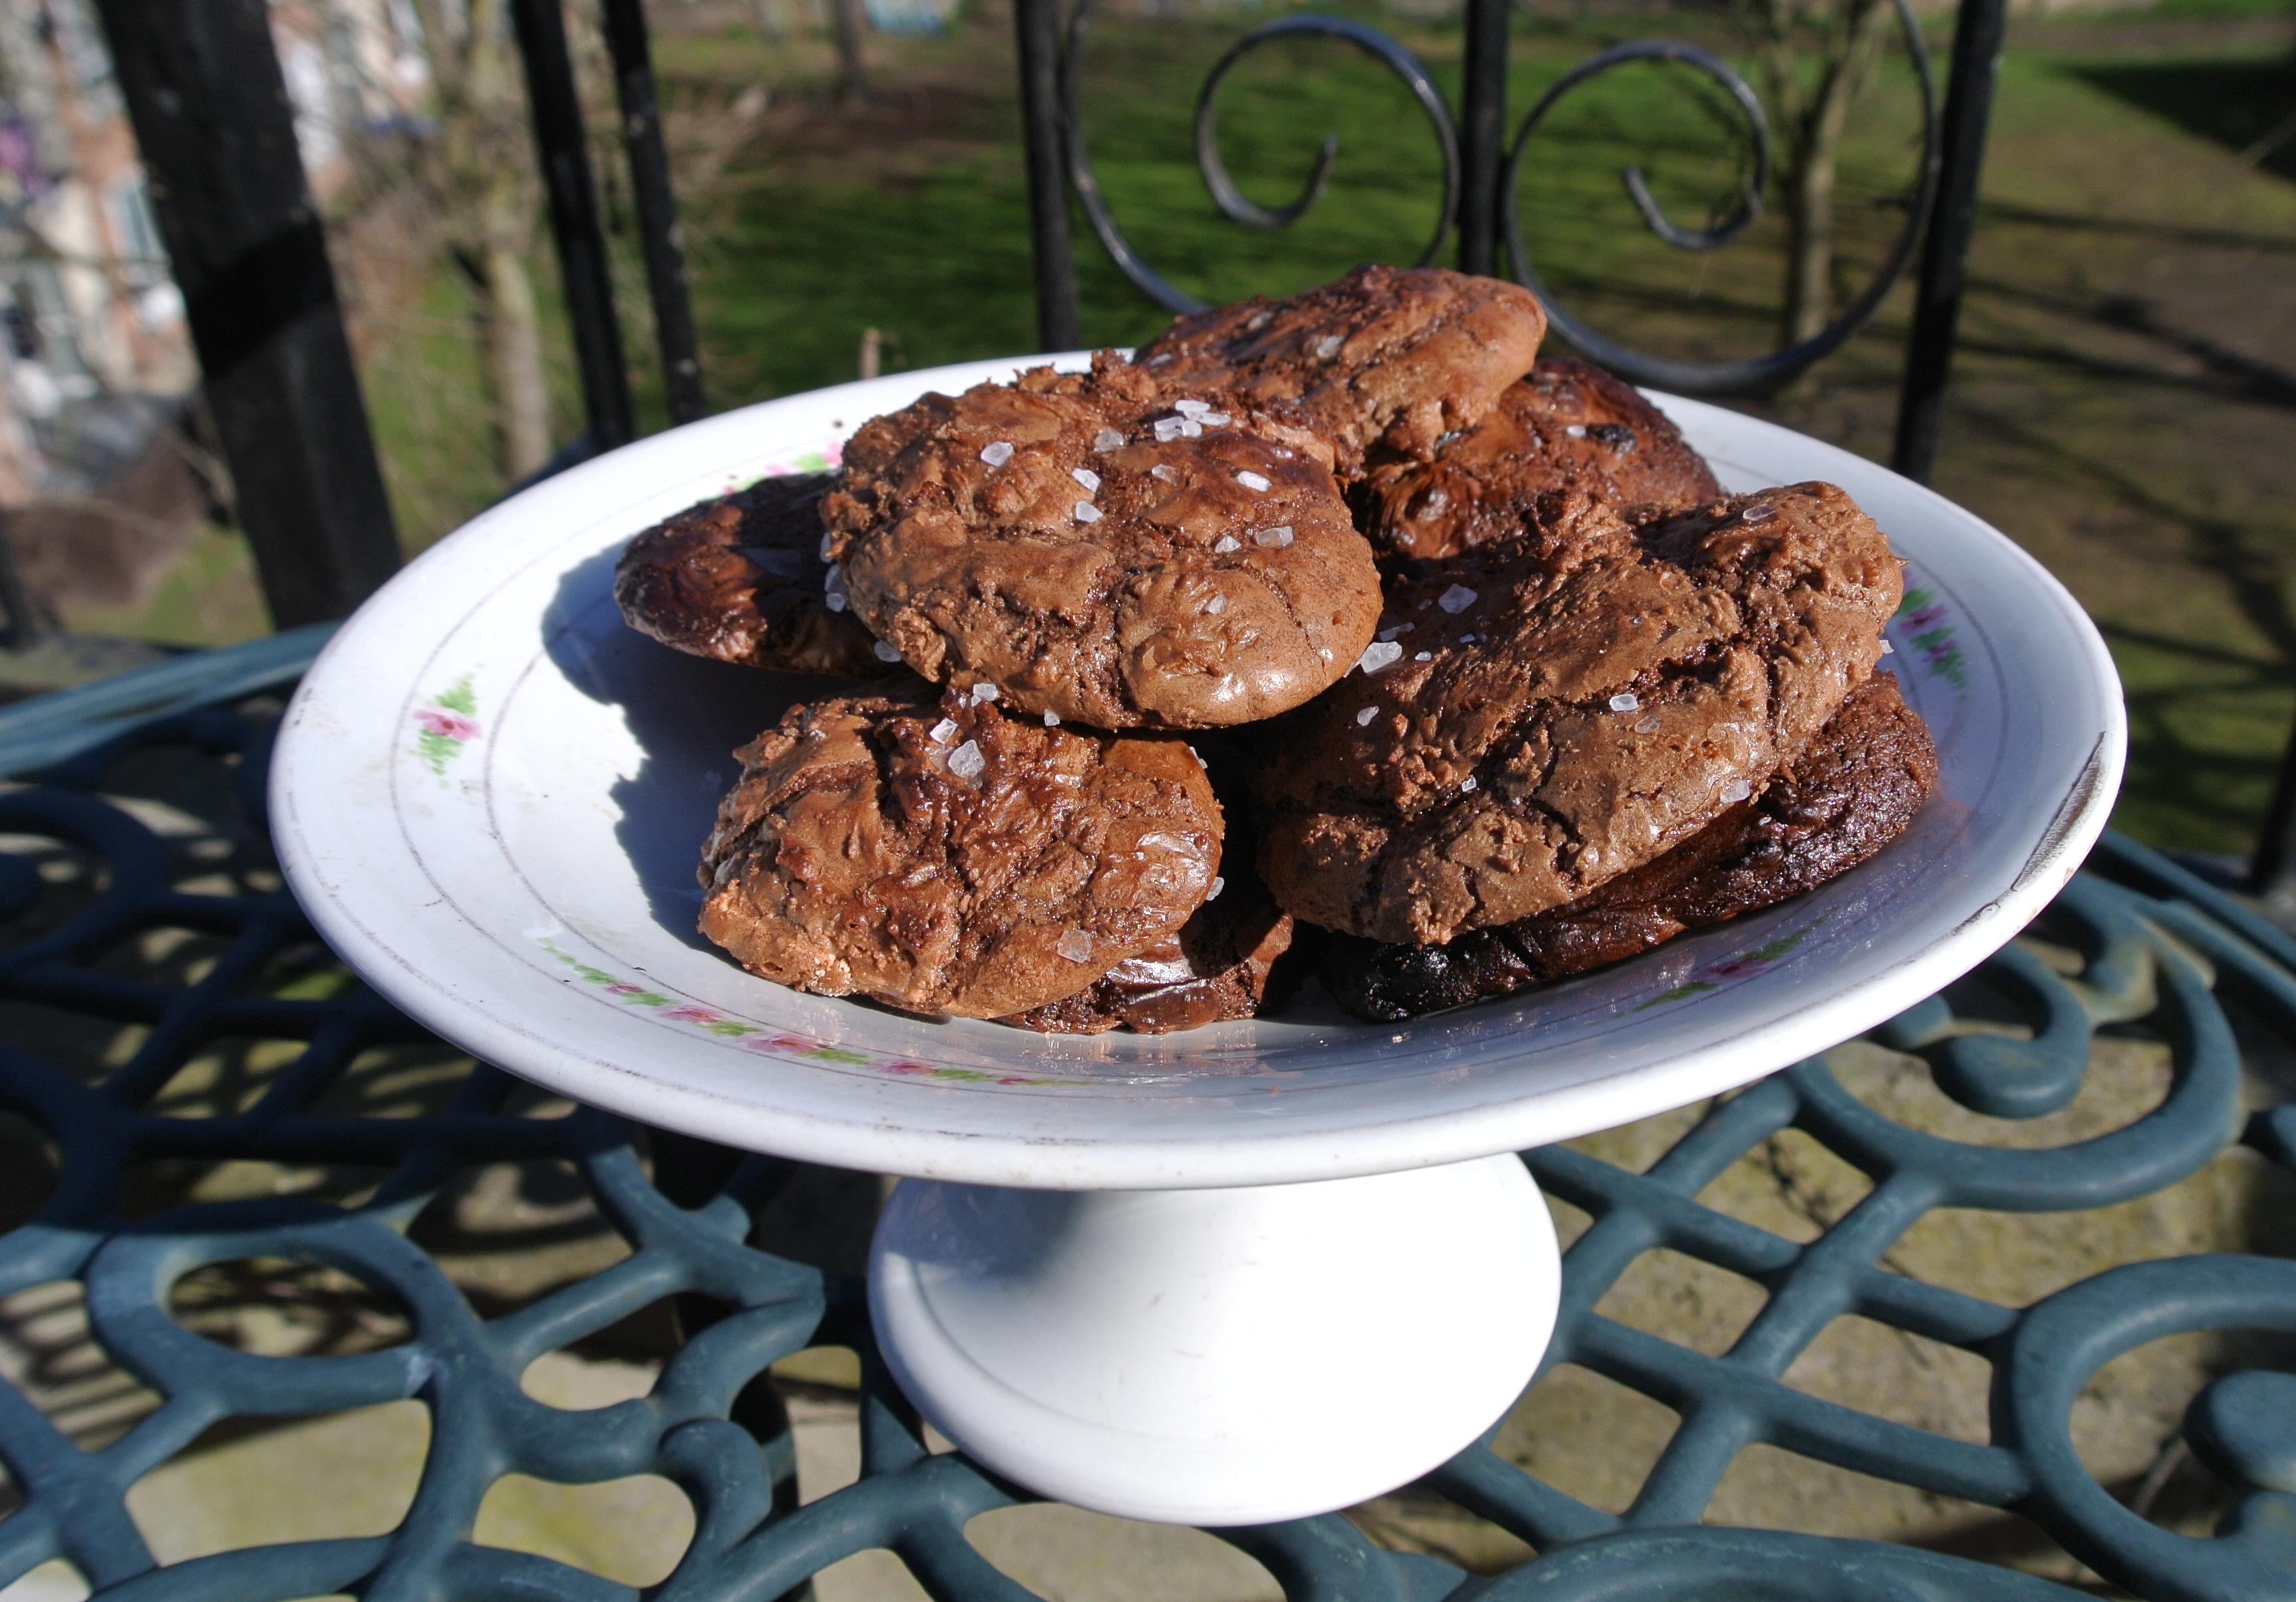 Chocolate cookies on white dish